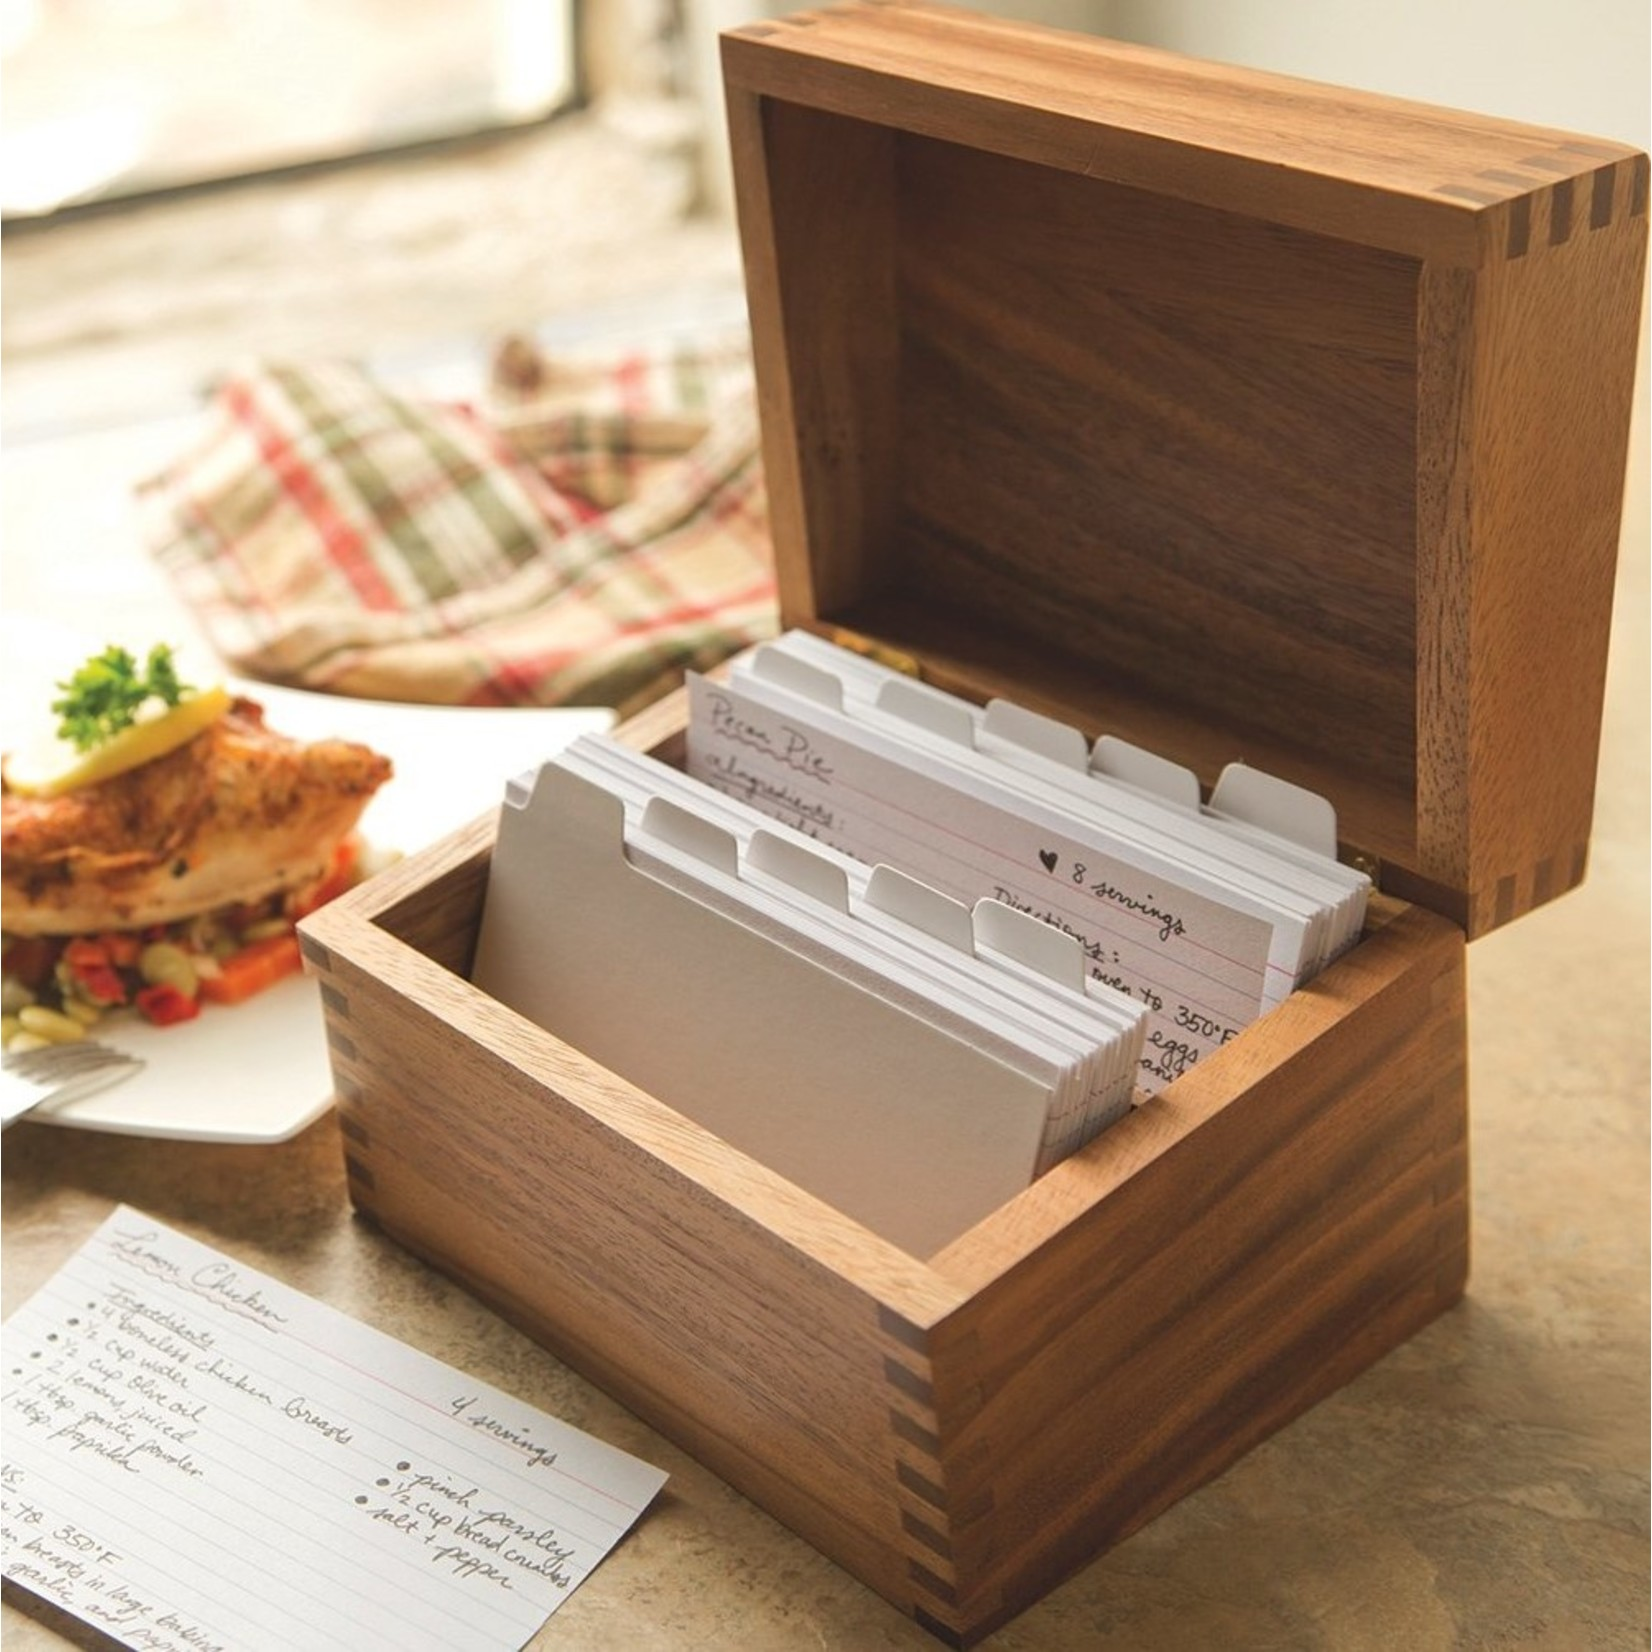 Ironwood Recipe Box with Cards